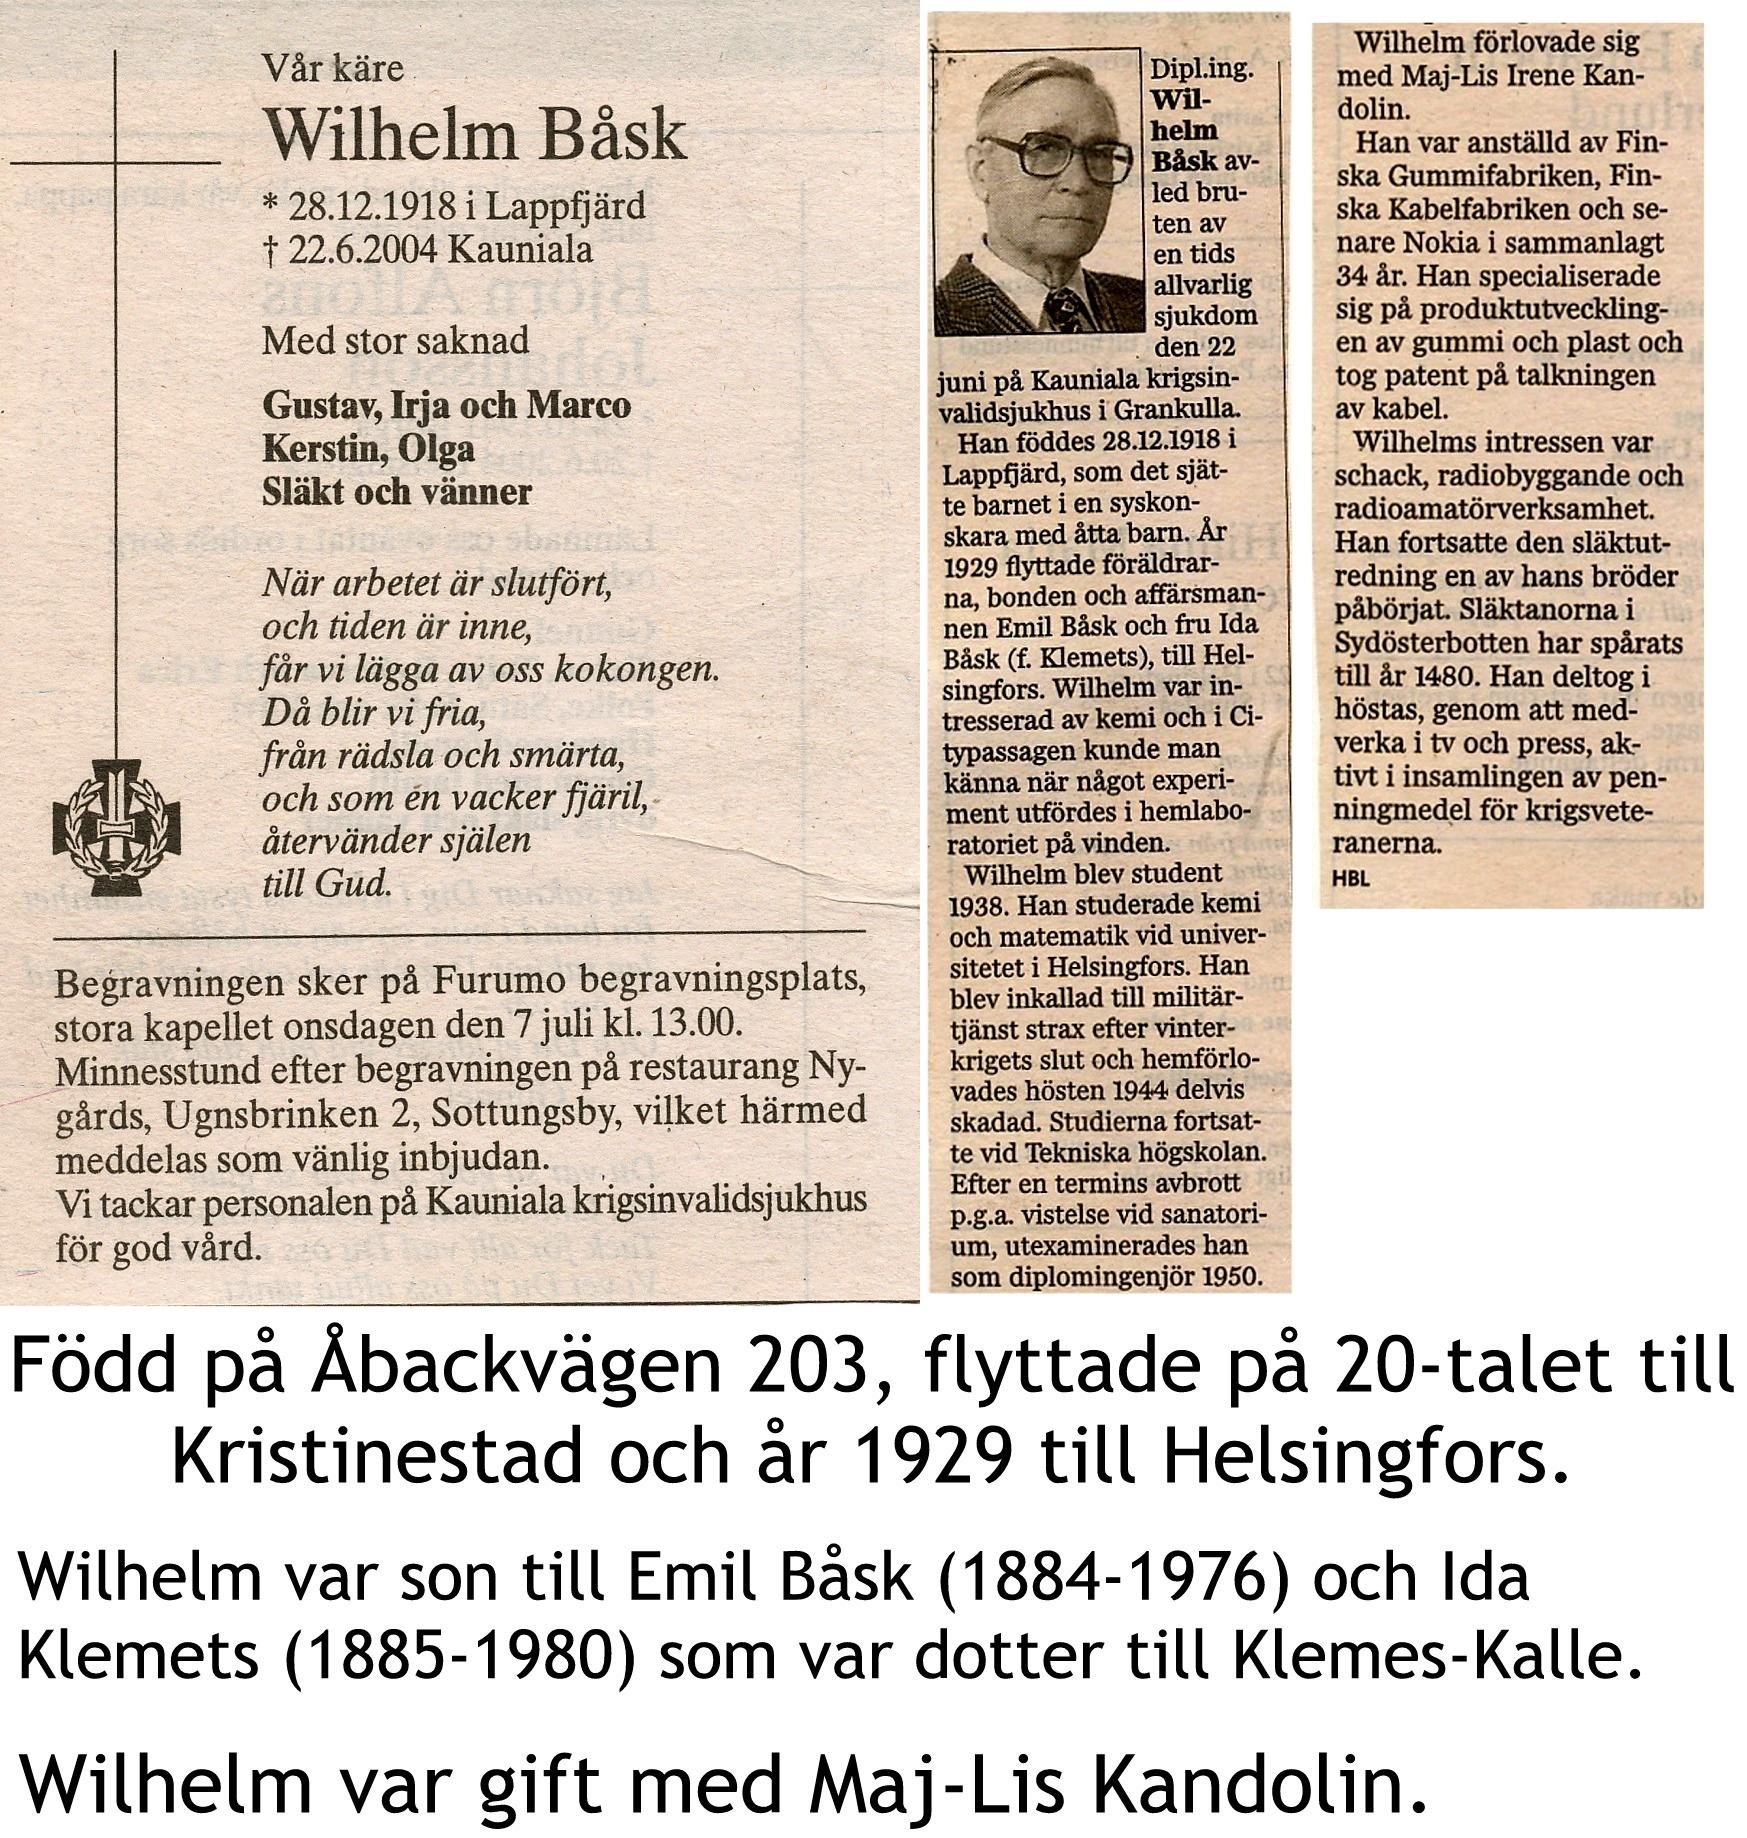 Båsk Wilhelm